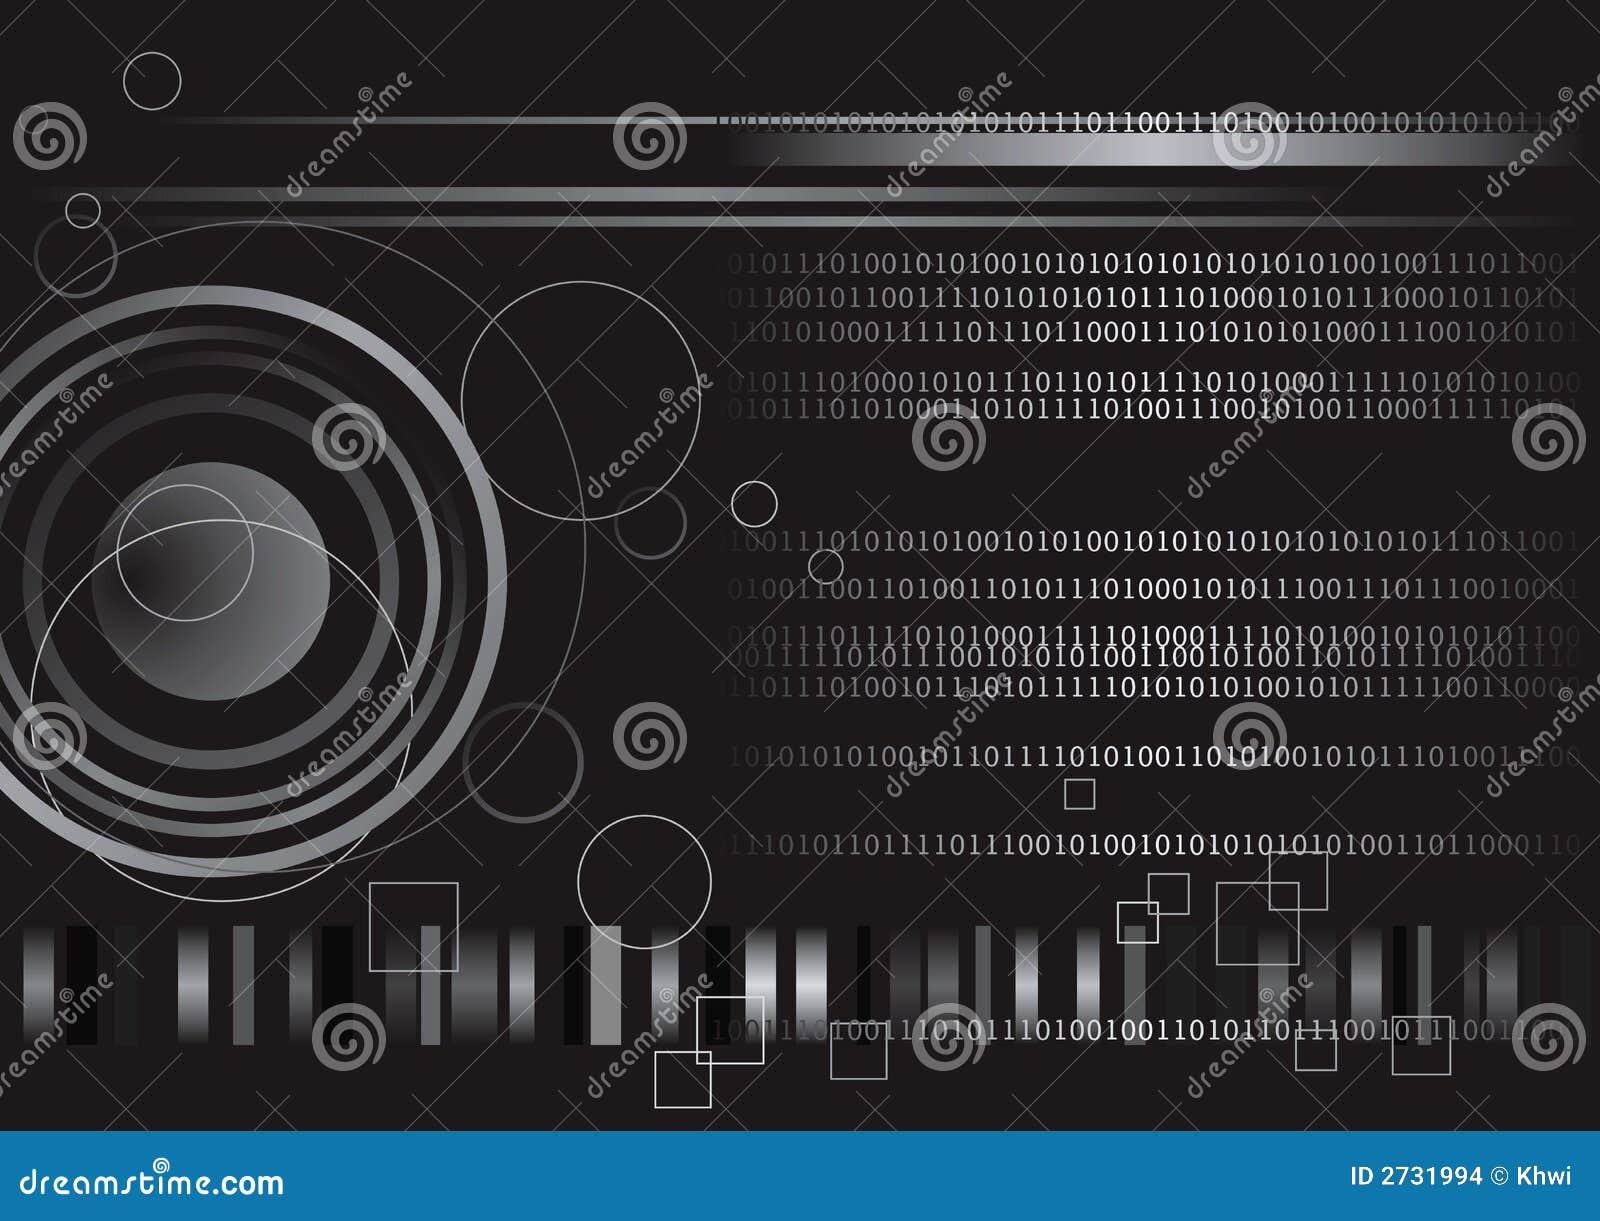 Digital Binary Code Technology Stock Vector - Image: 2731994